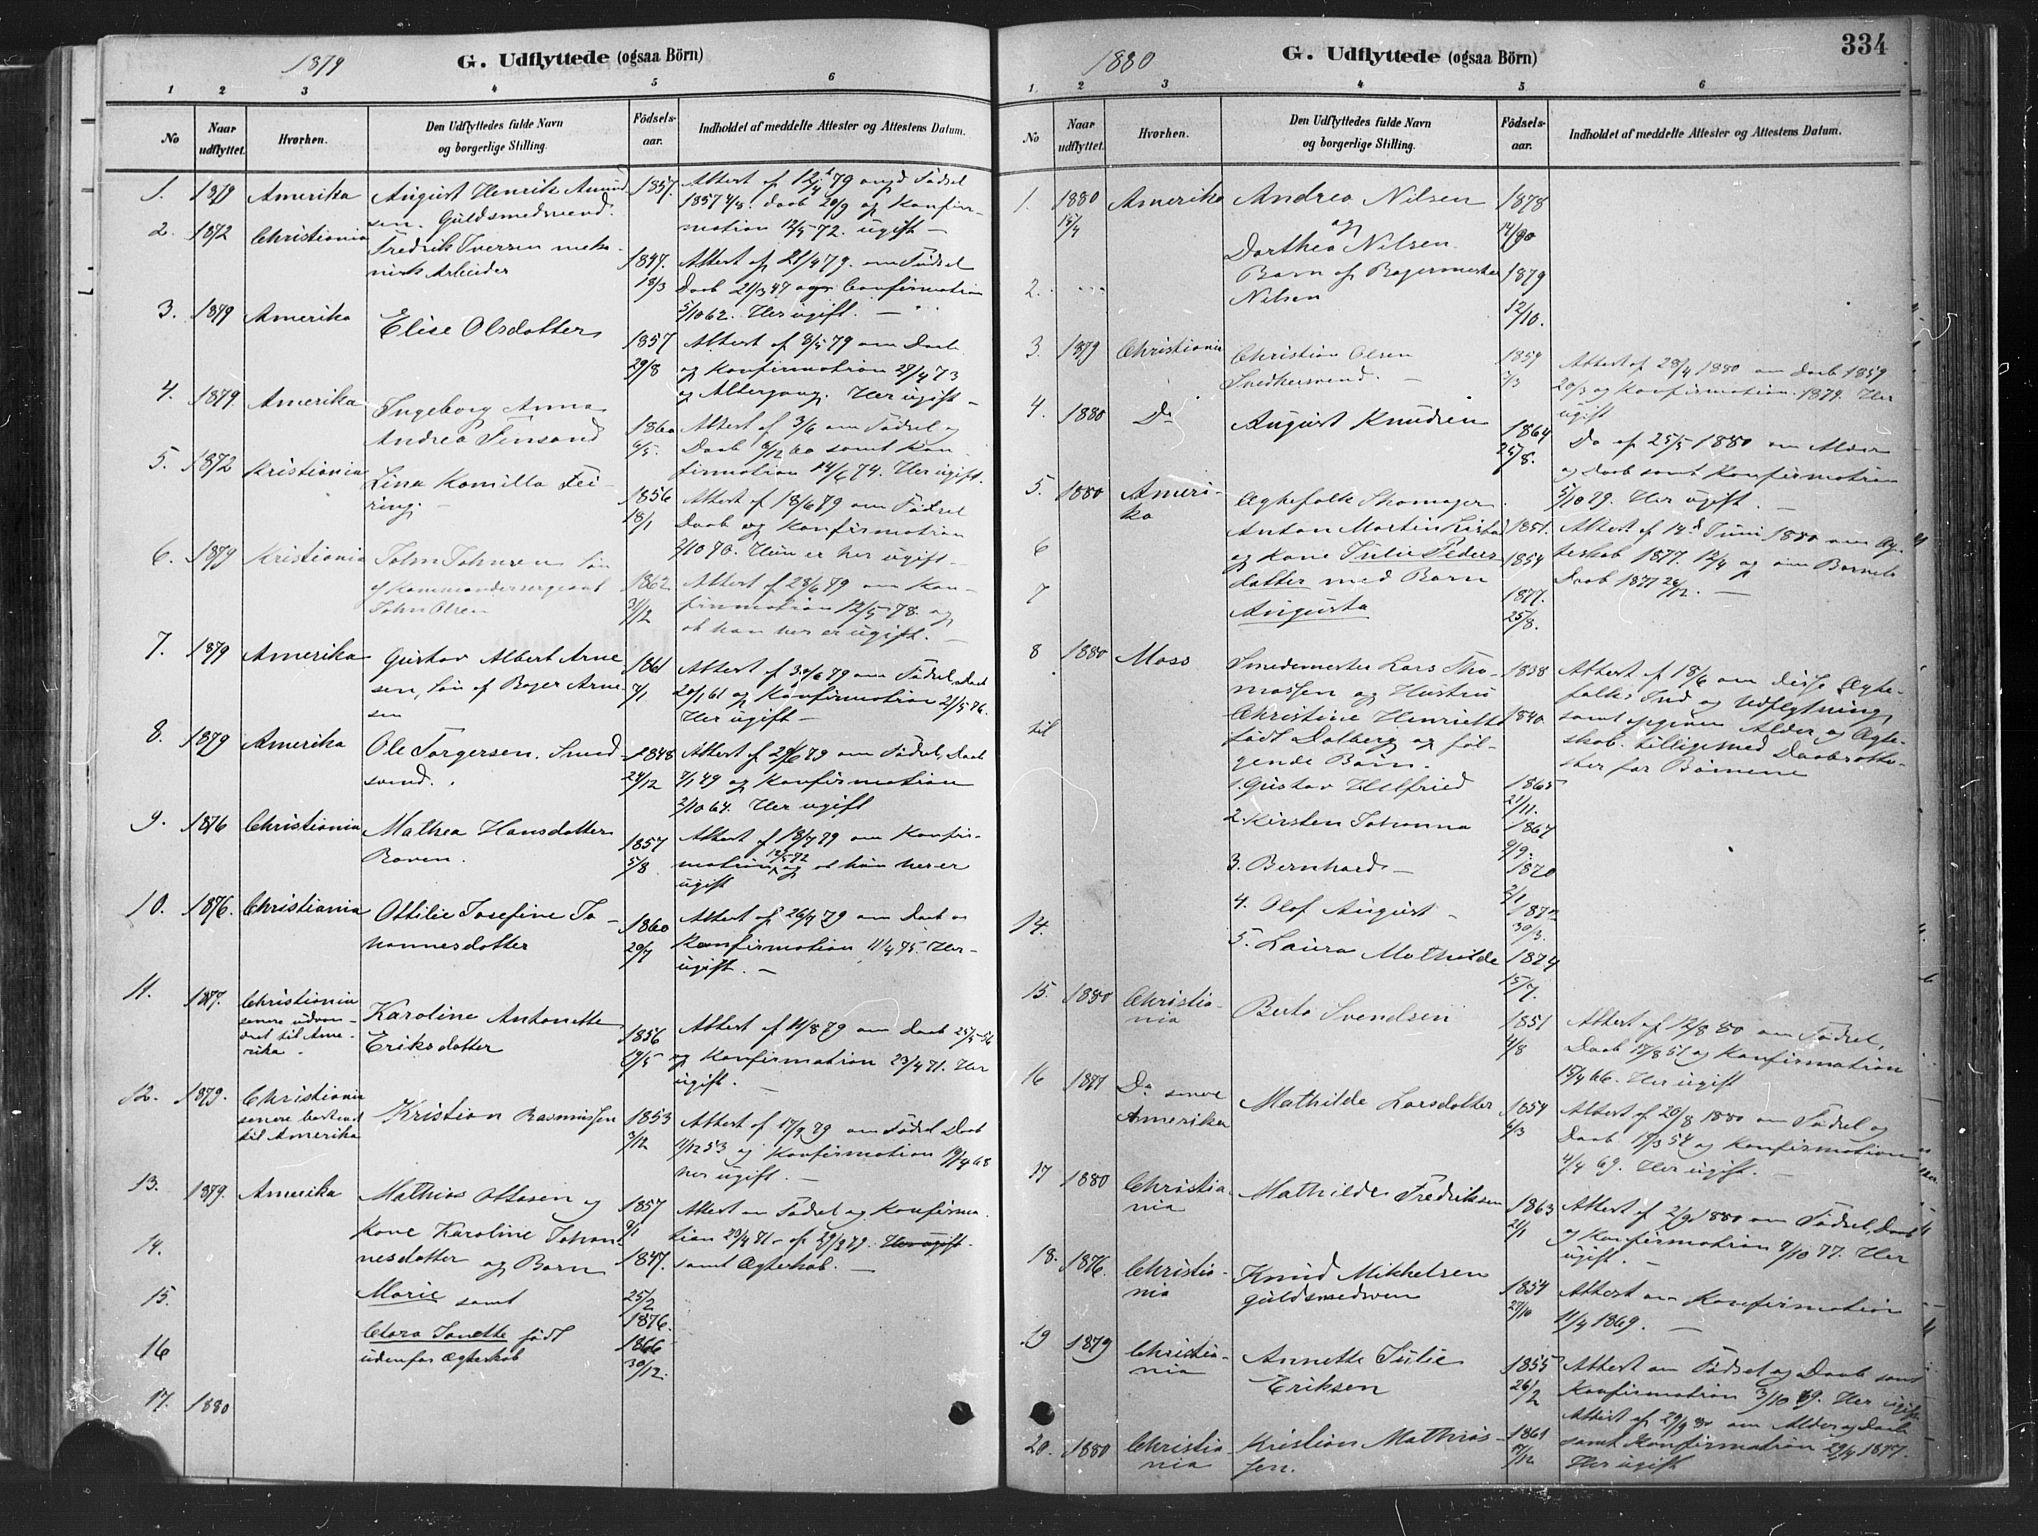 SAH, Fåberg prestekontor, Ministerialbok nr. 10, 1879-1900, s. 334